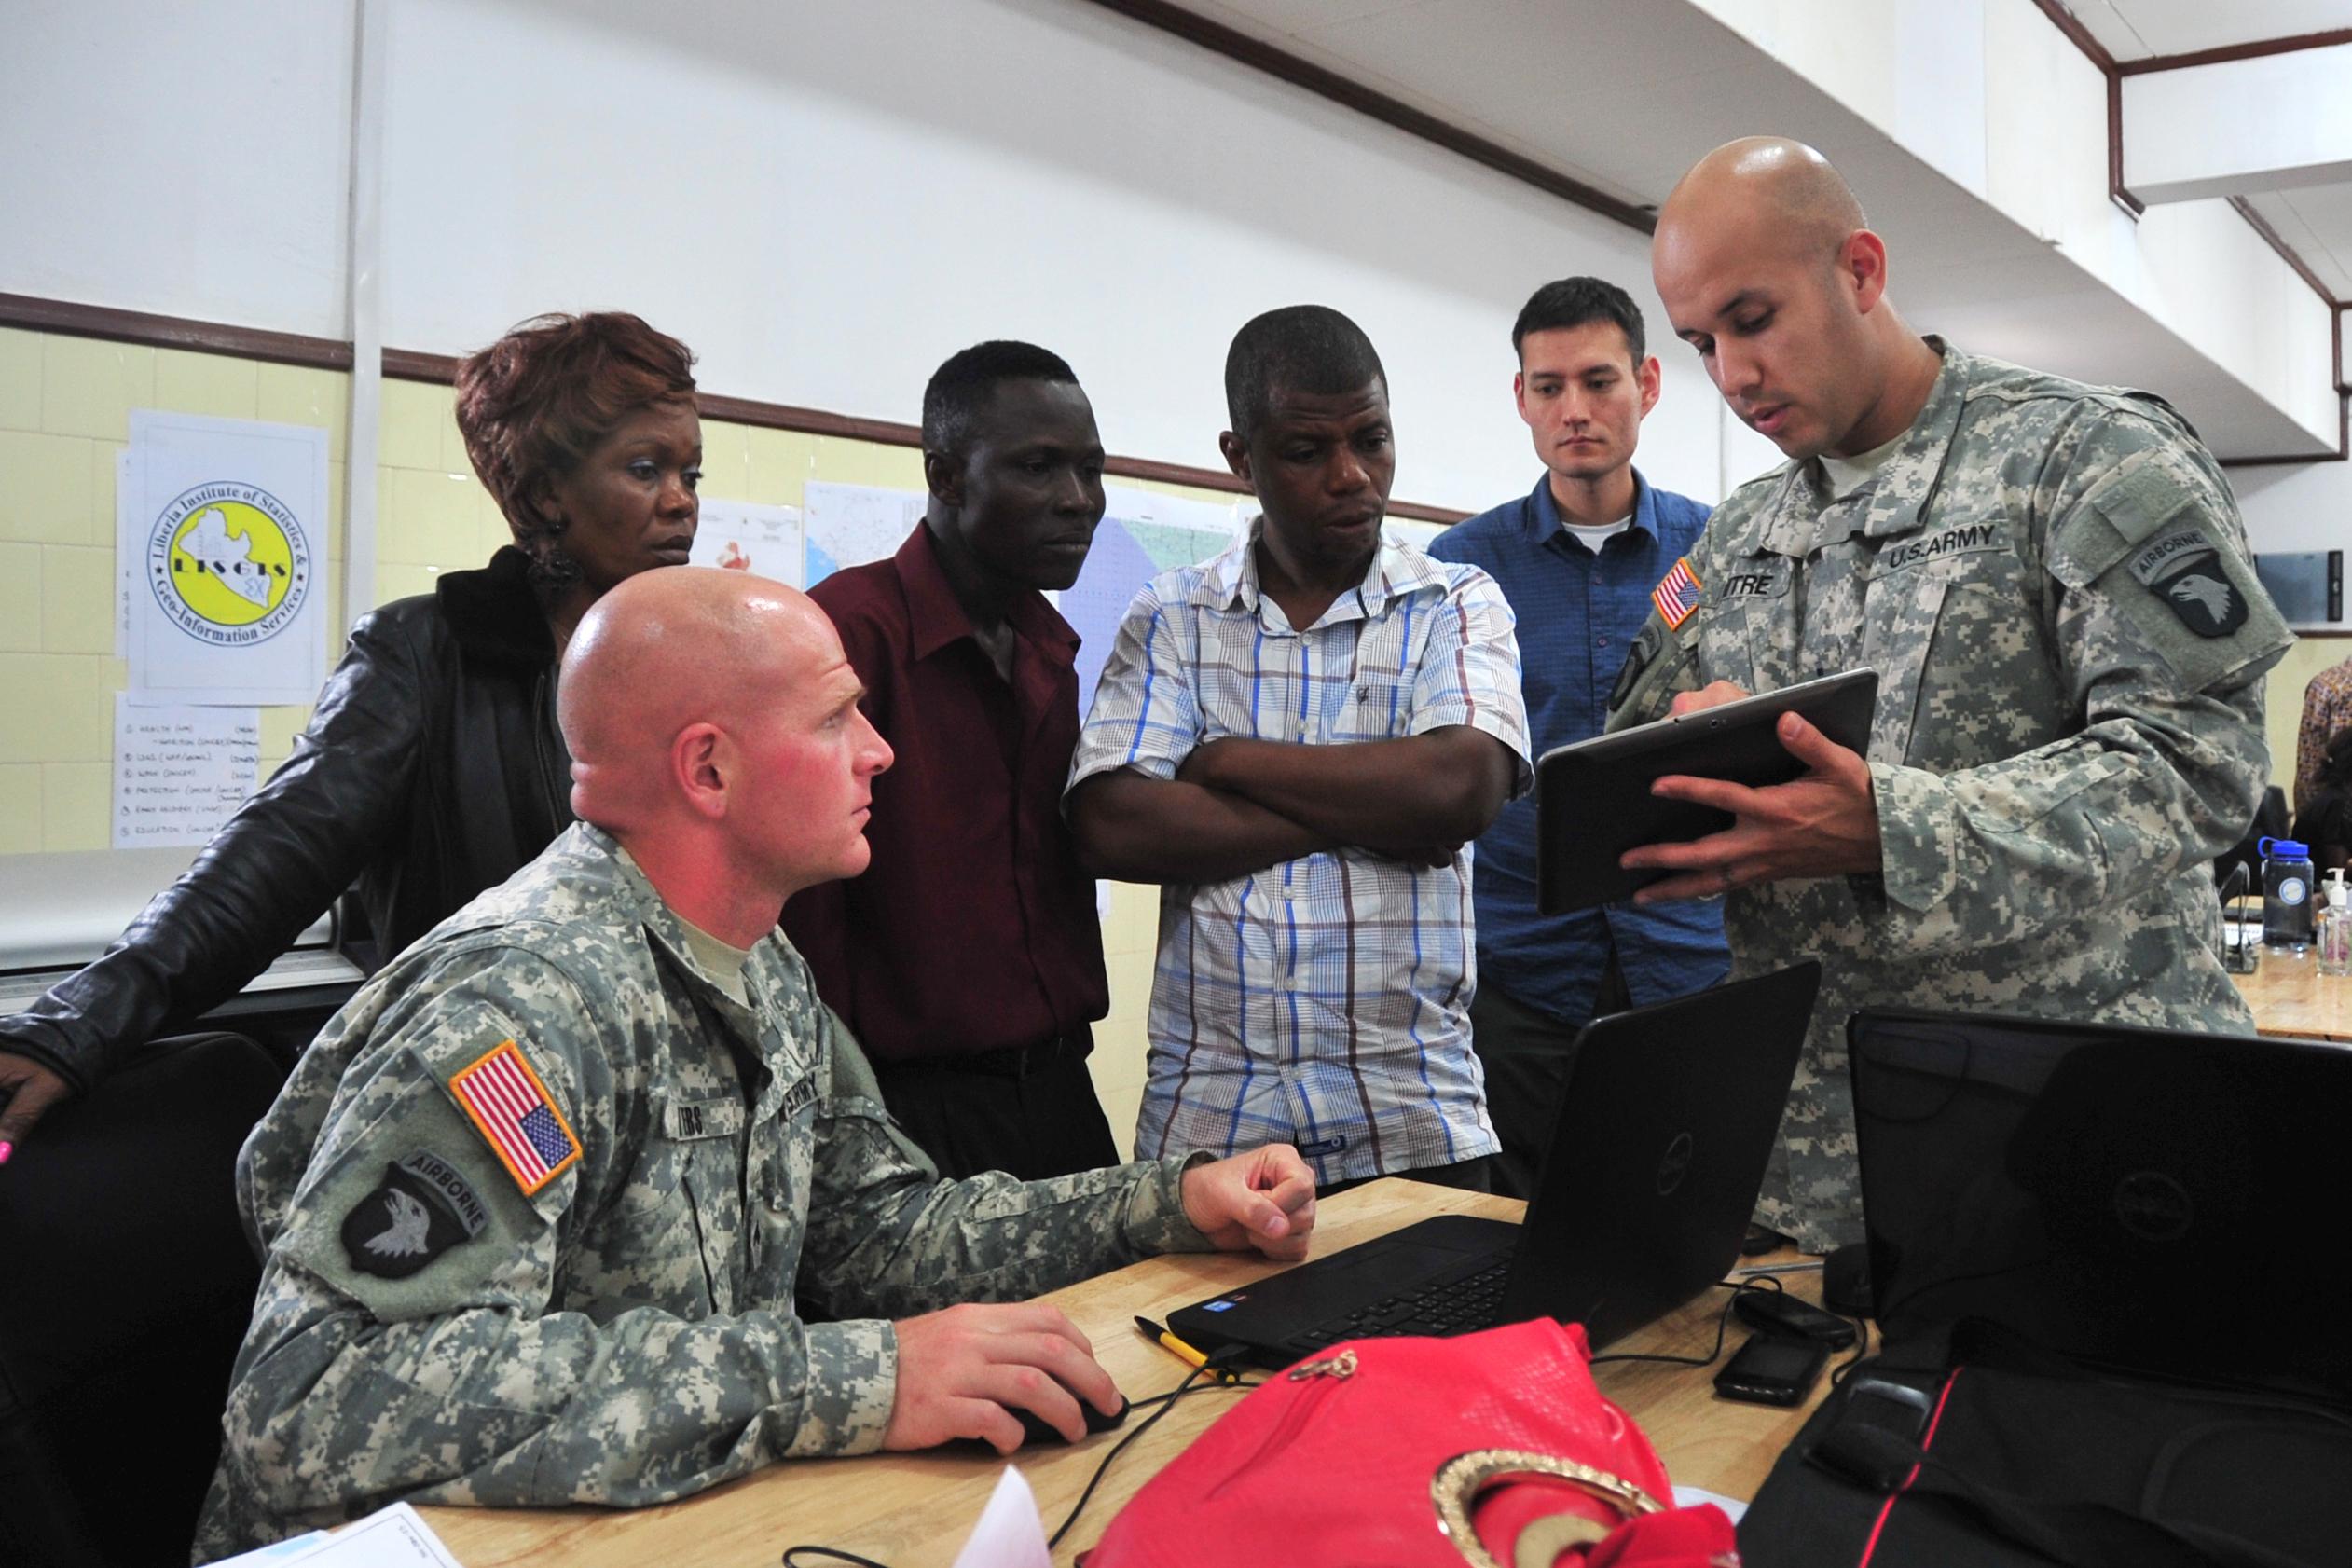 Dod Agency Offers Public Geospatial Intel To Help Ebola Fight